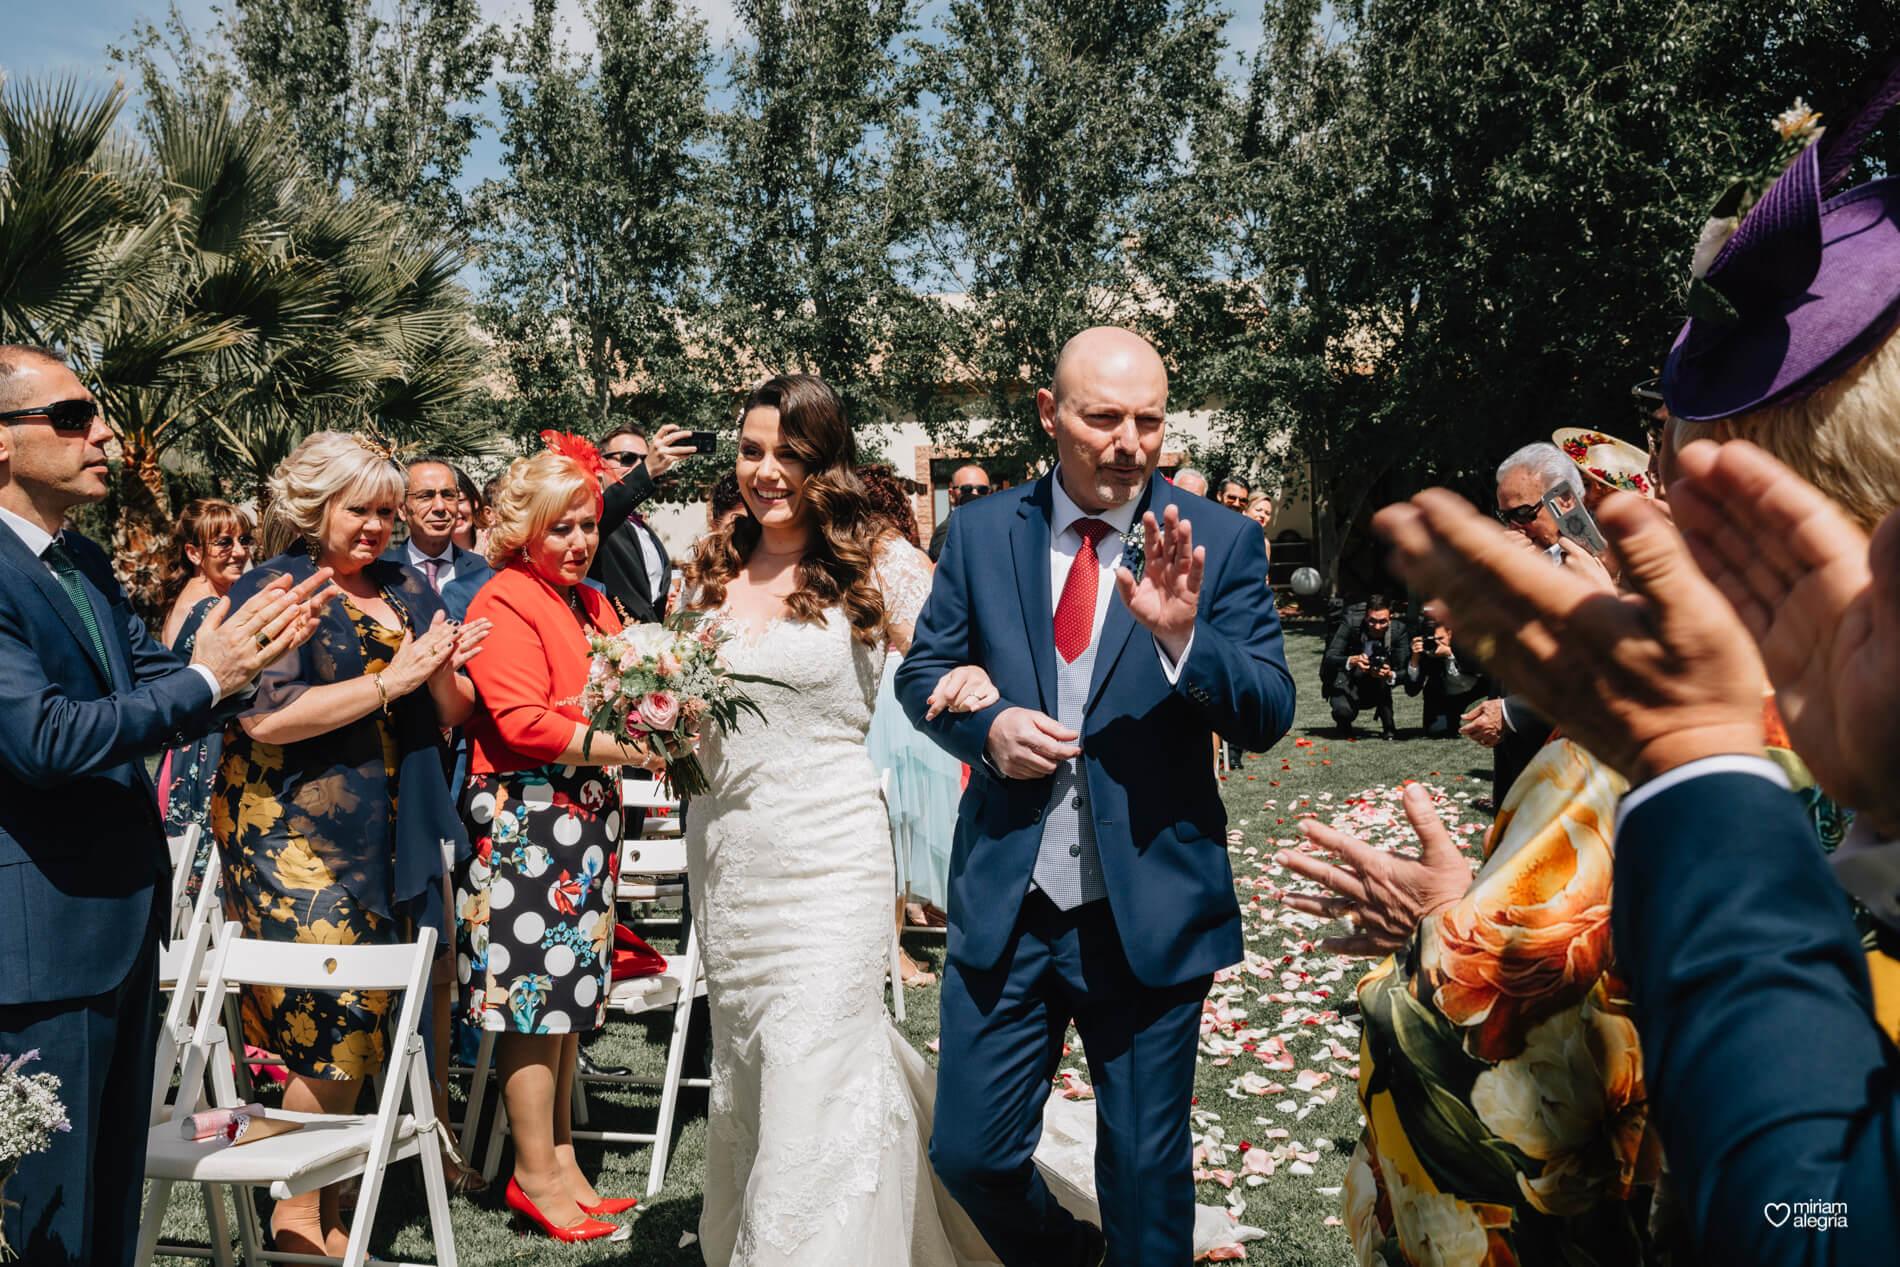 boda-en-finca-jurosa-miriam-alegria-47